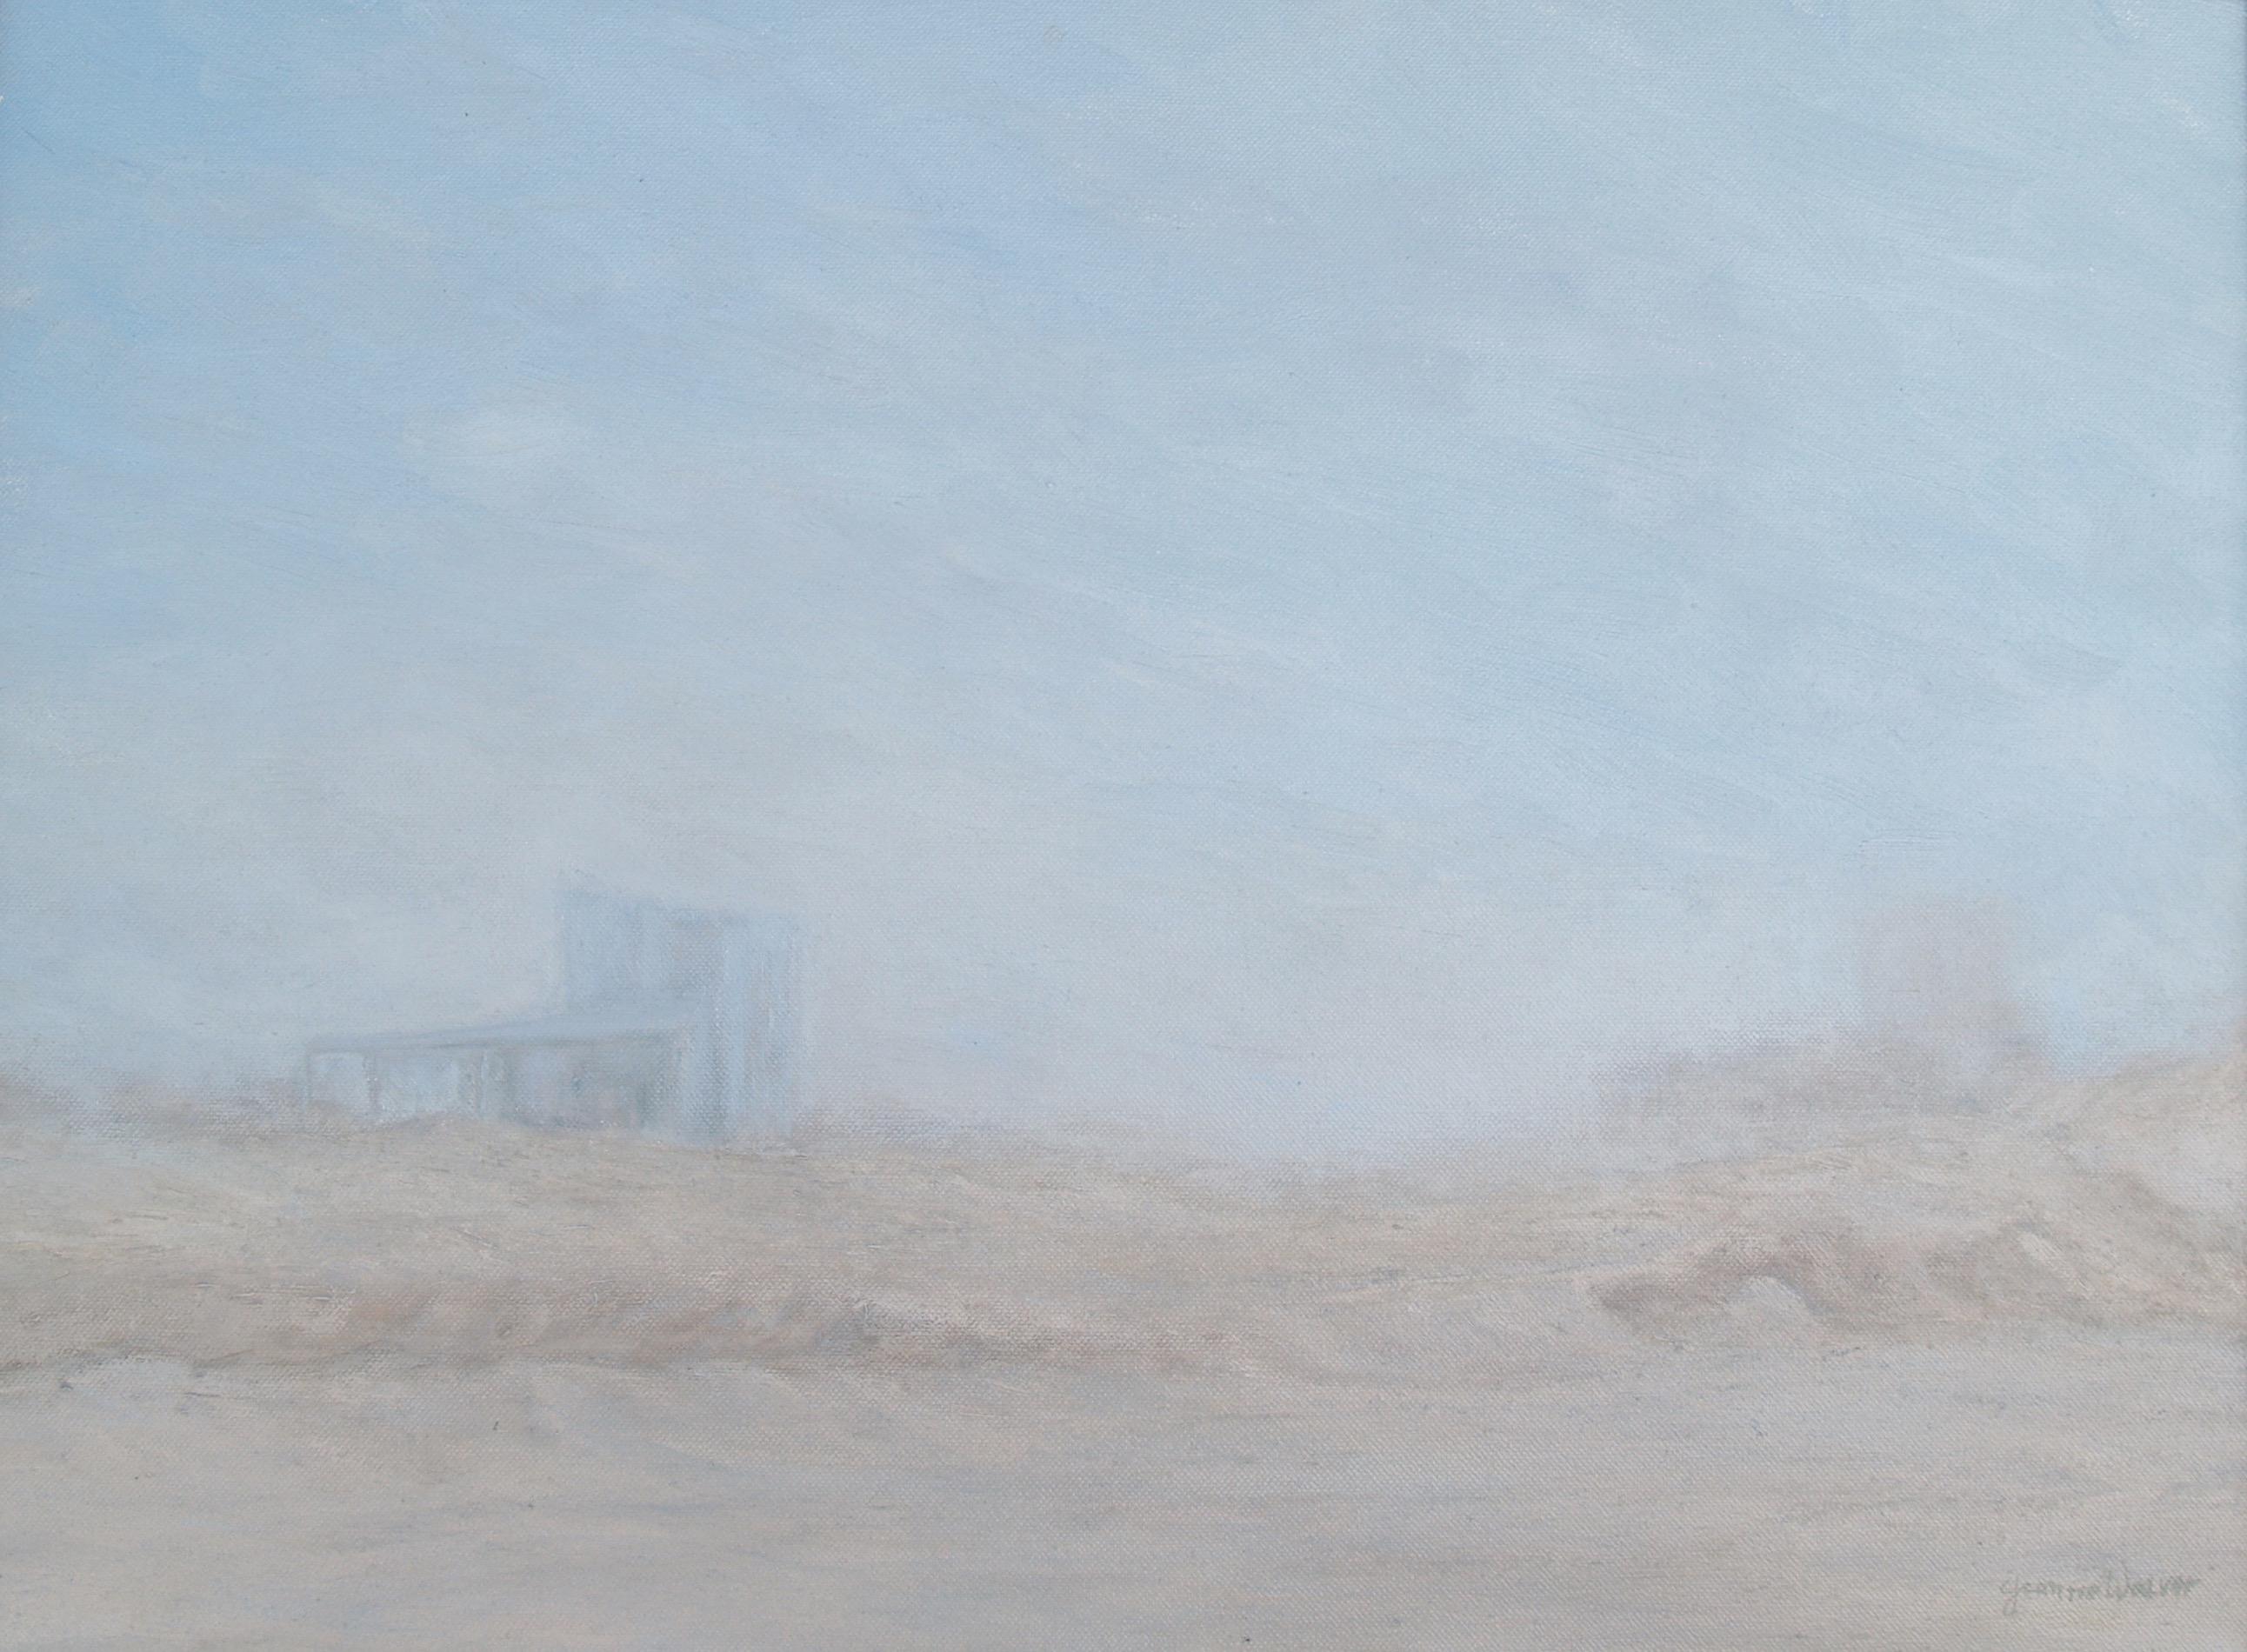 Fog Bank, Uruguay